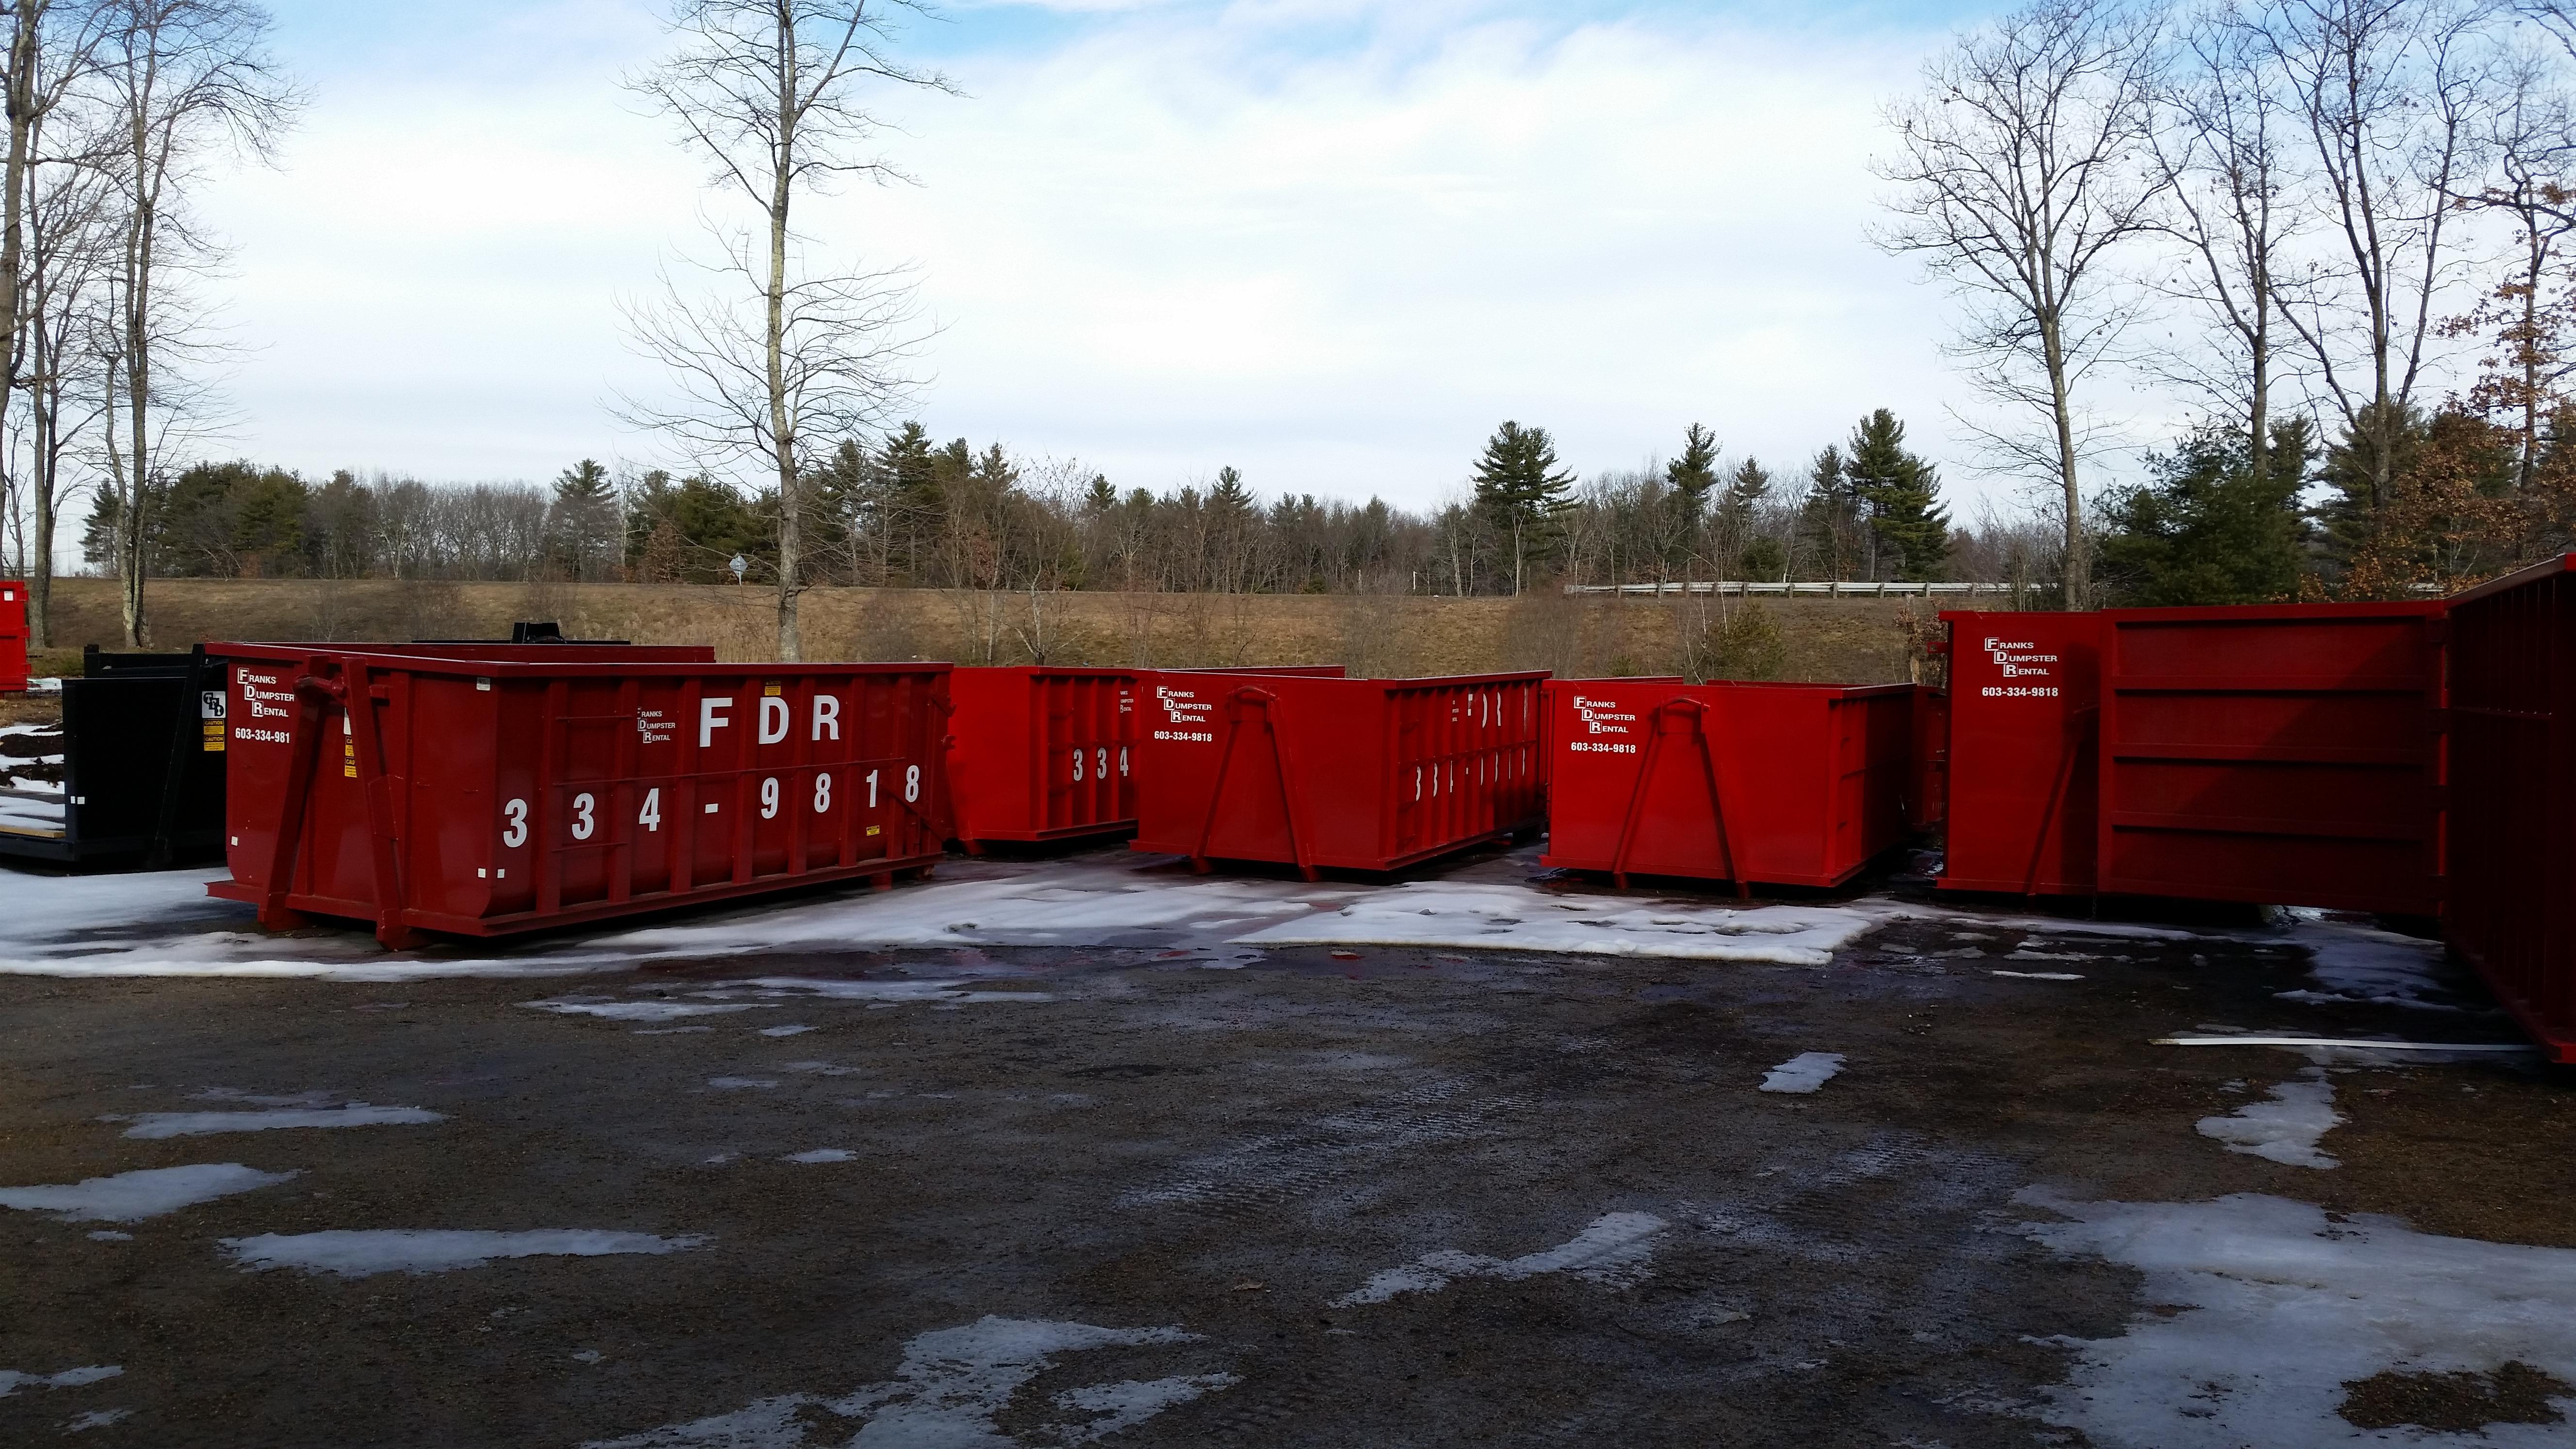 Franks Dumpster Rental In Greenland Nh 03840